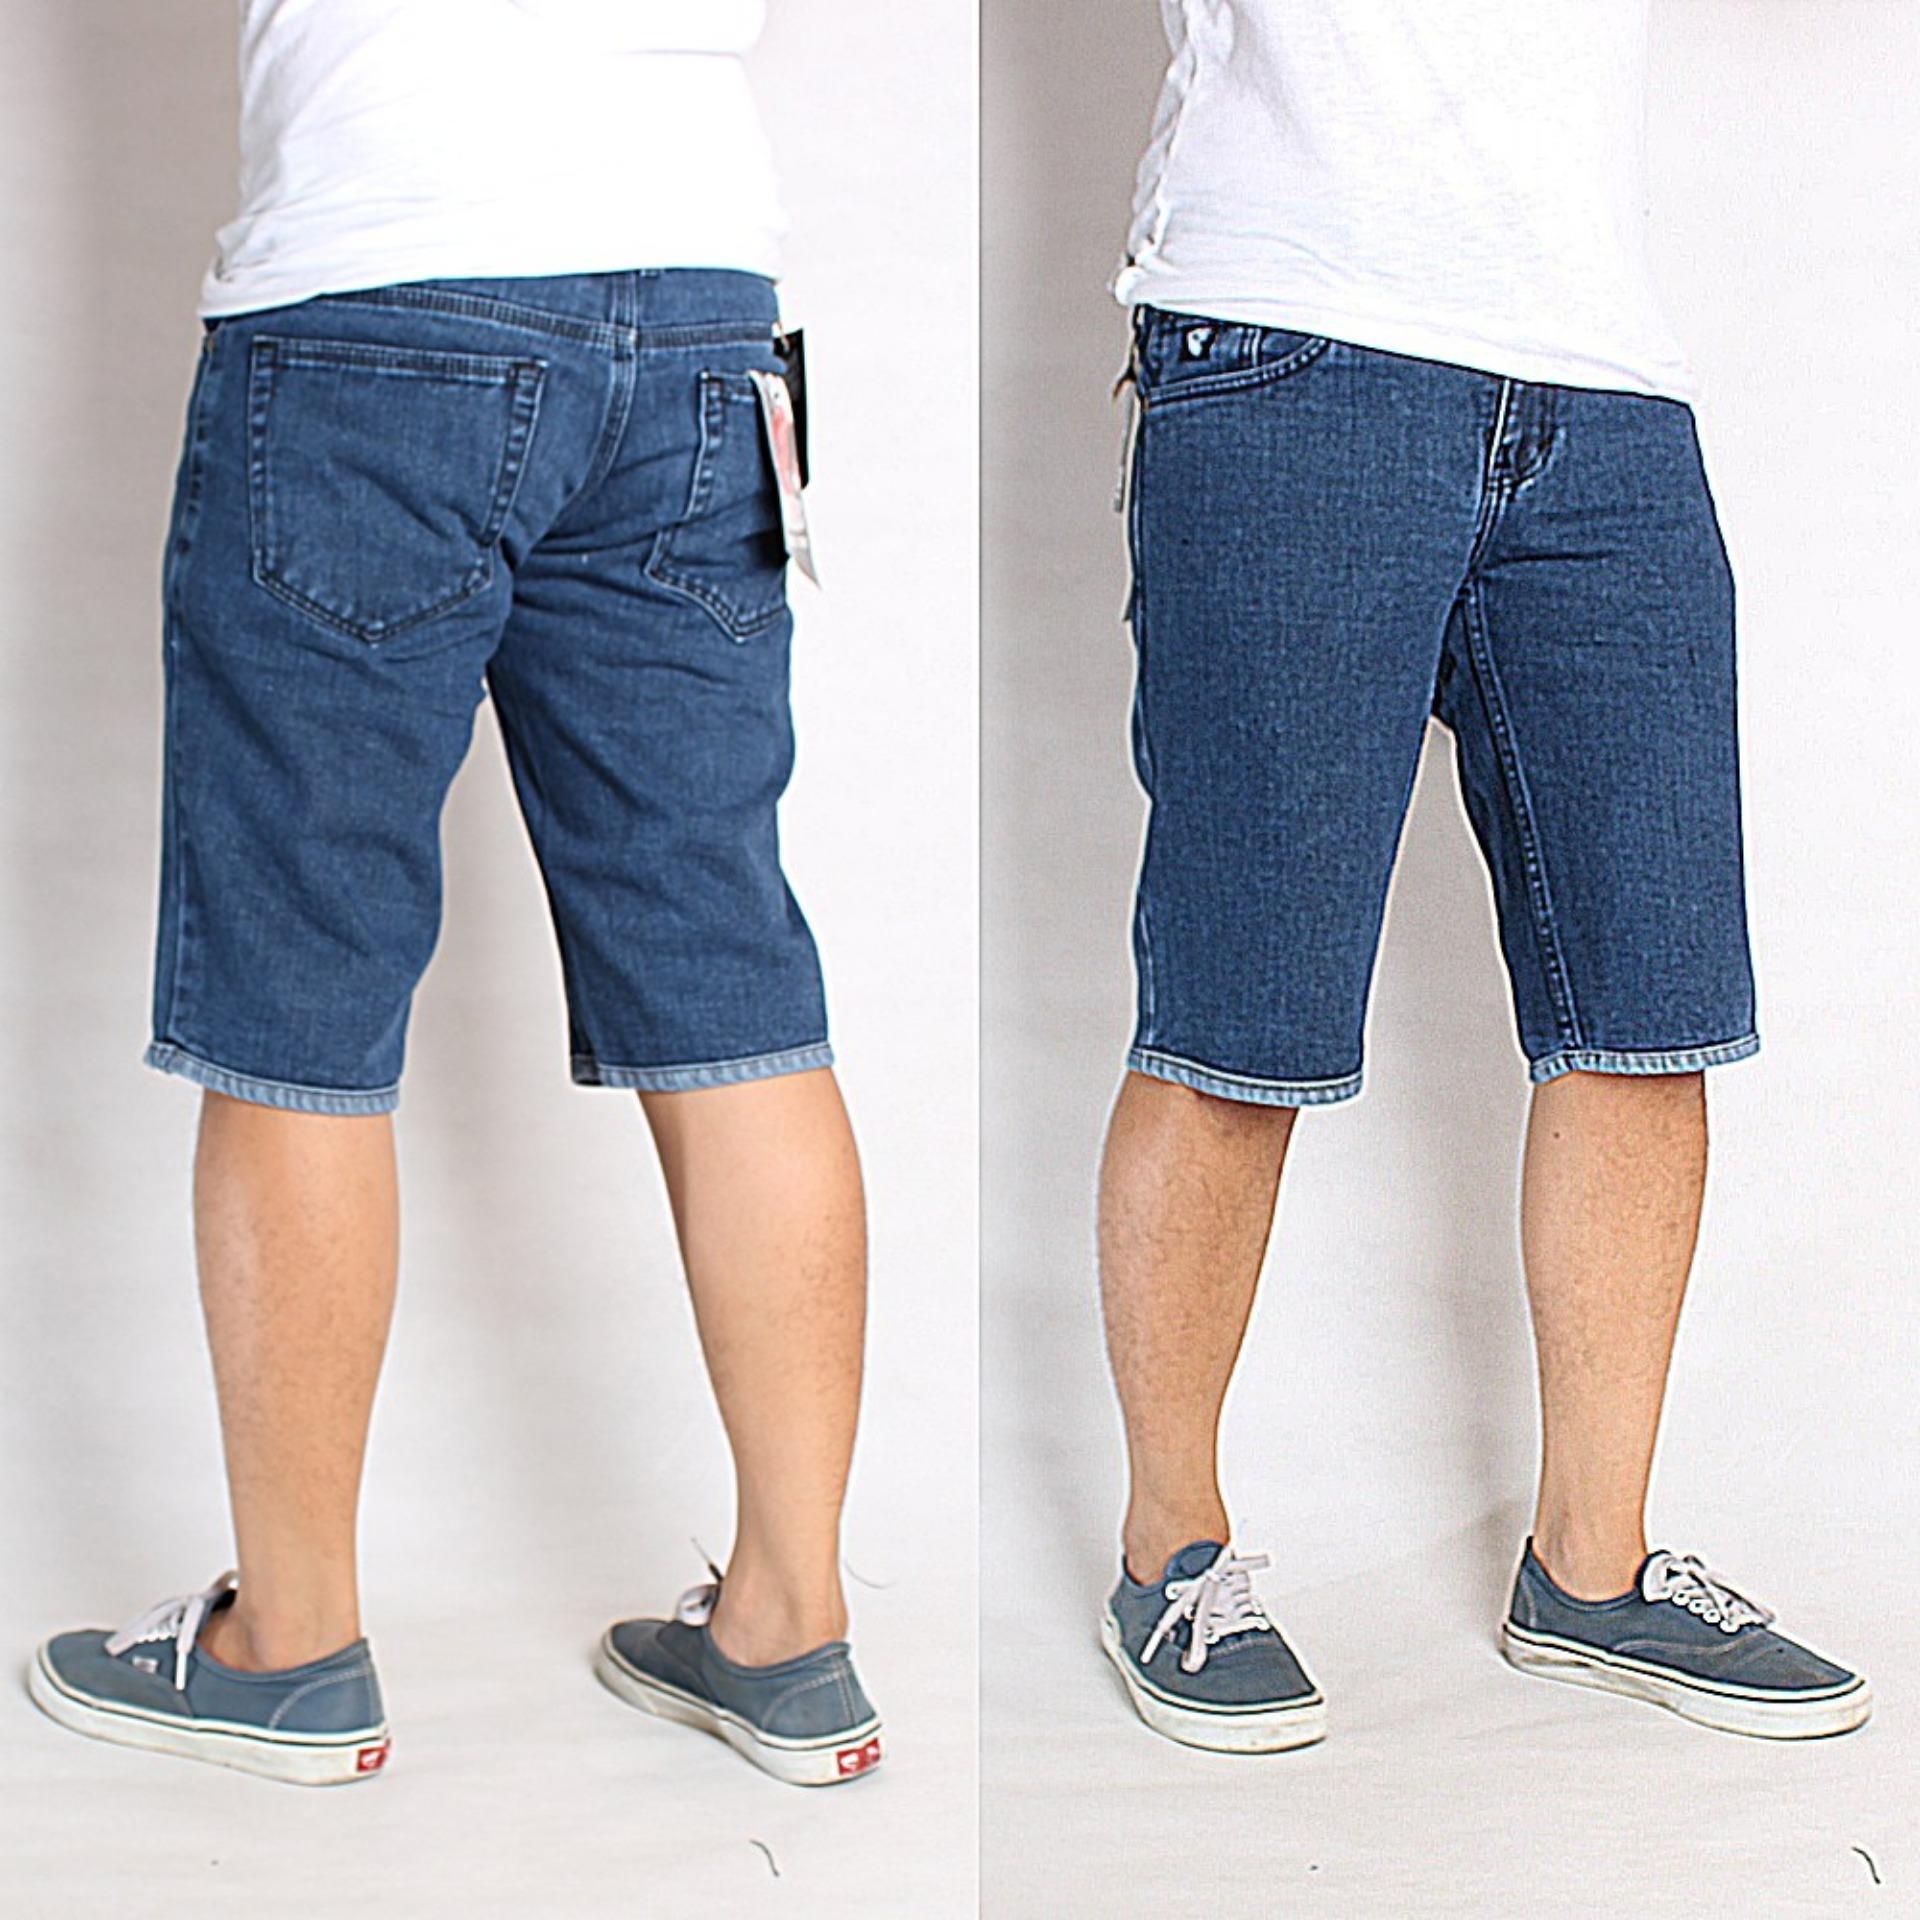 Toko Sw Celana Jeans Pendek Pria Biru Online